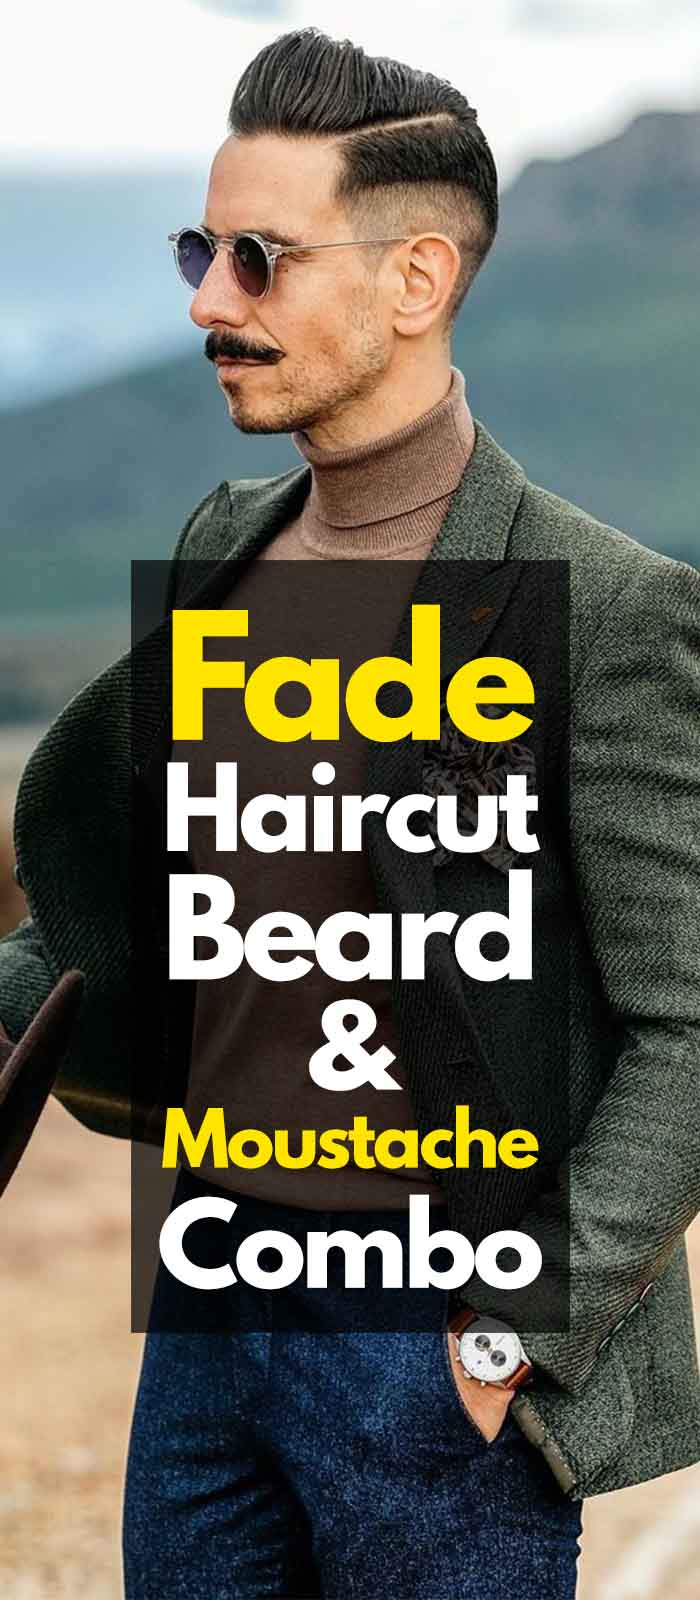 Fade Haircut, Beard & Moustache – Combo Guide For 2019